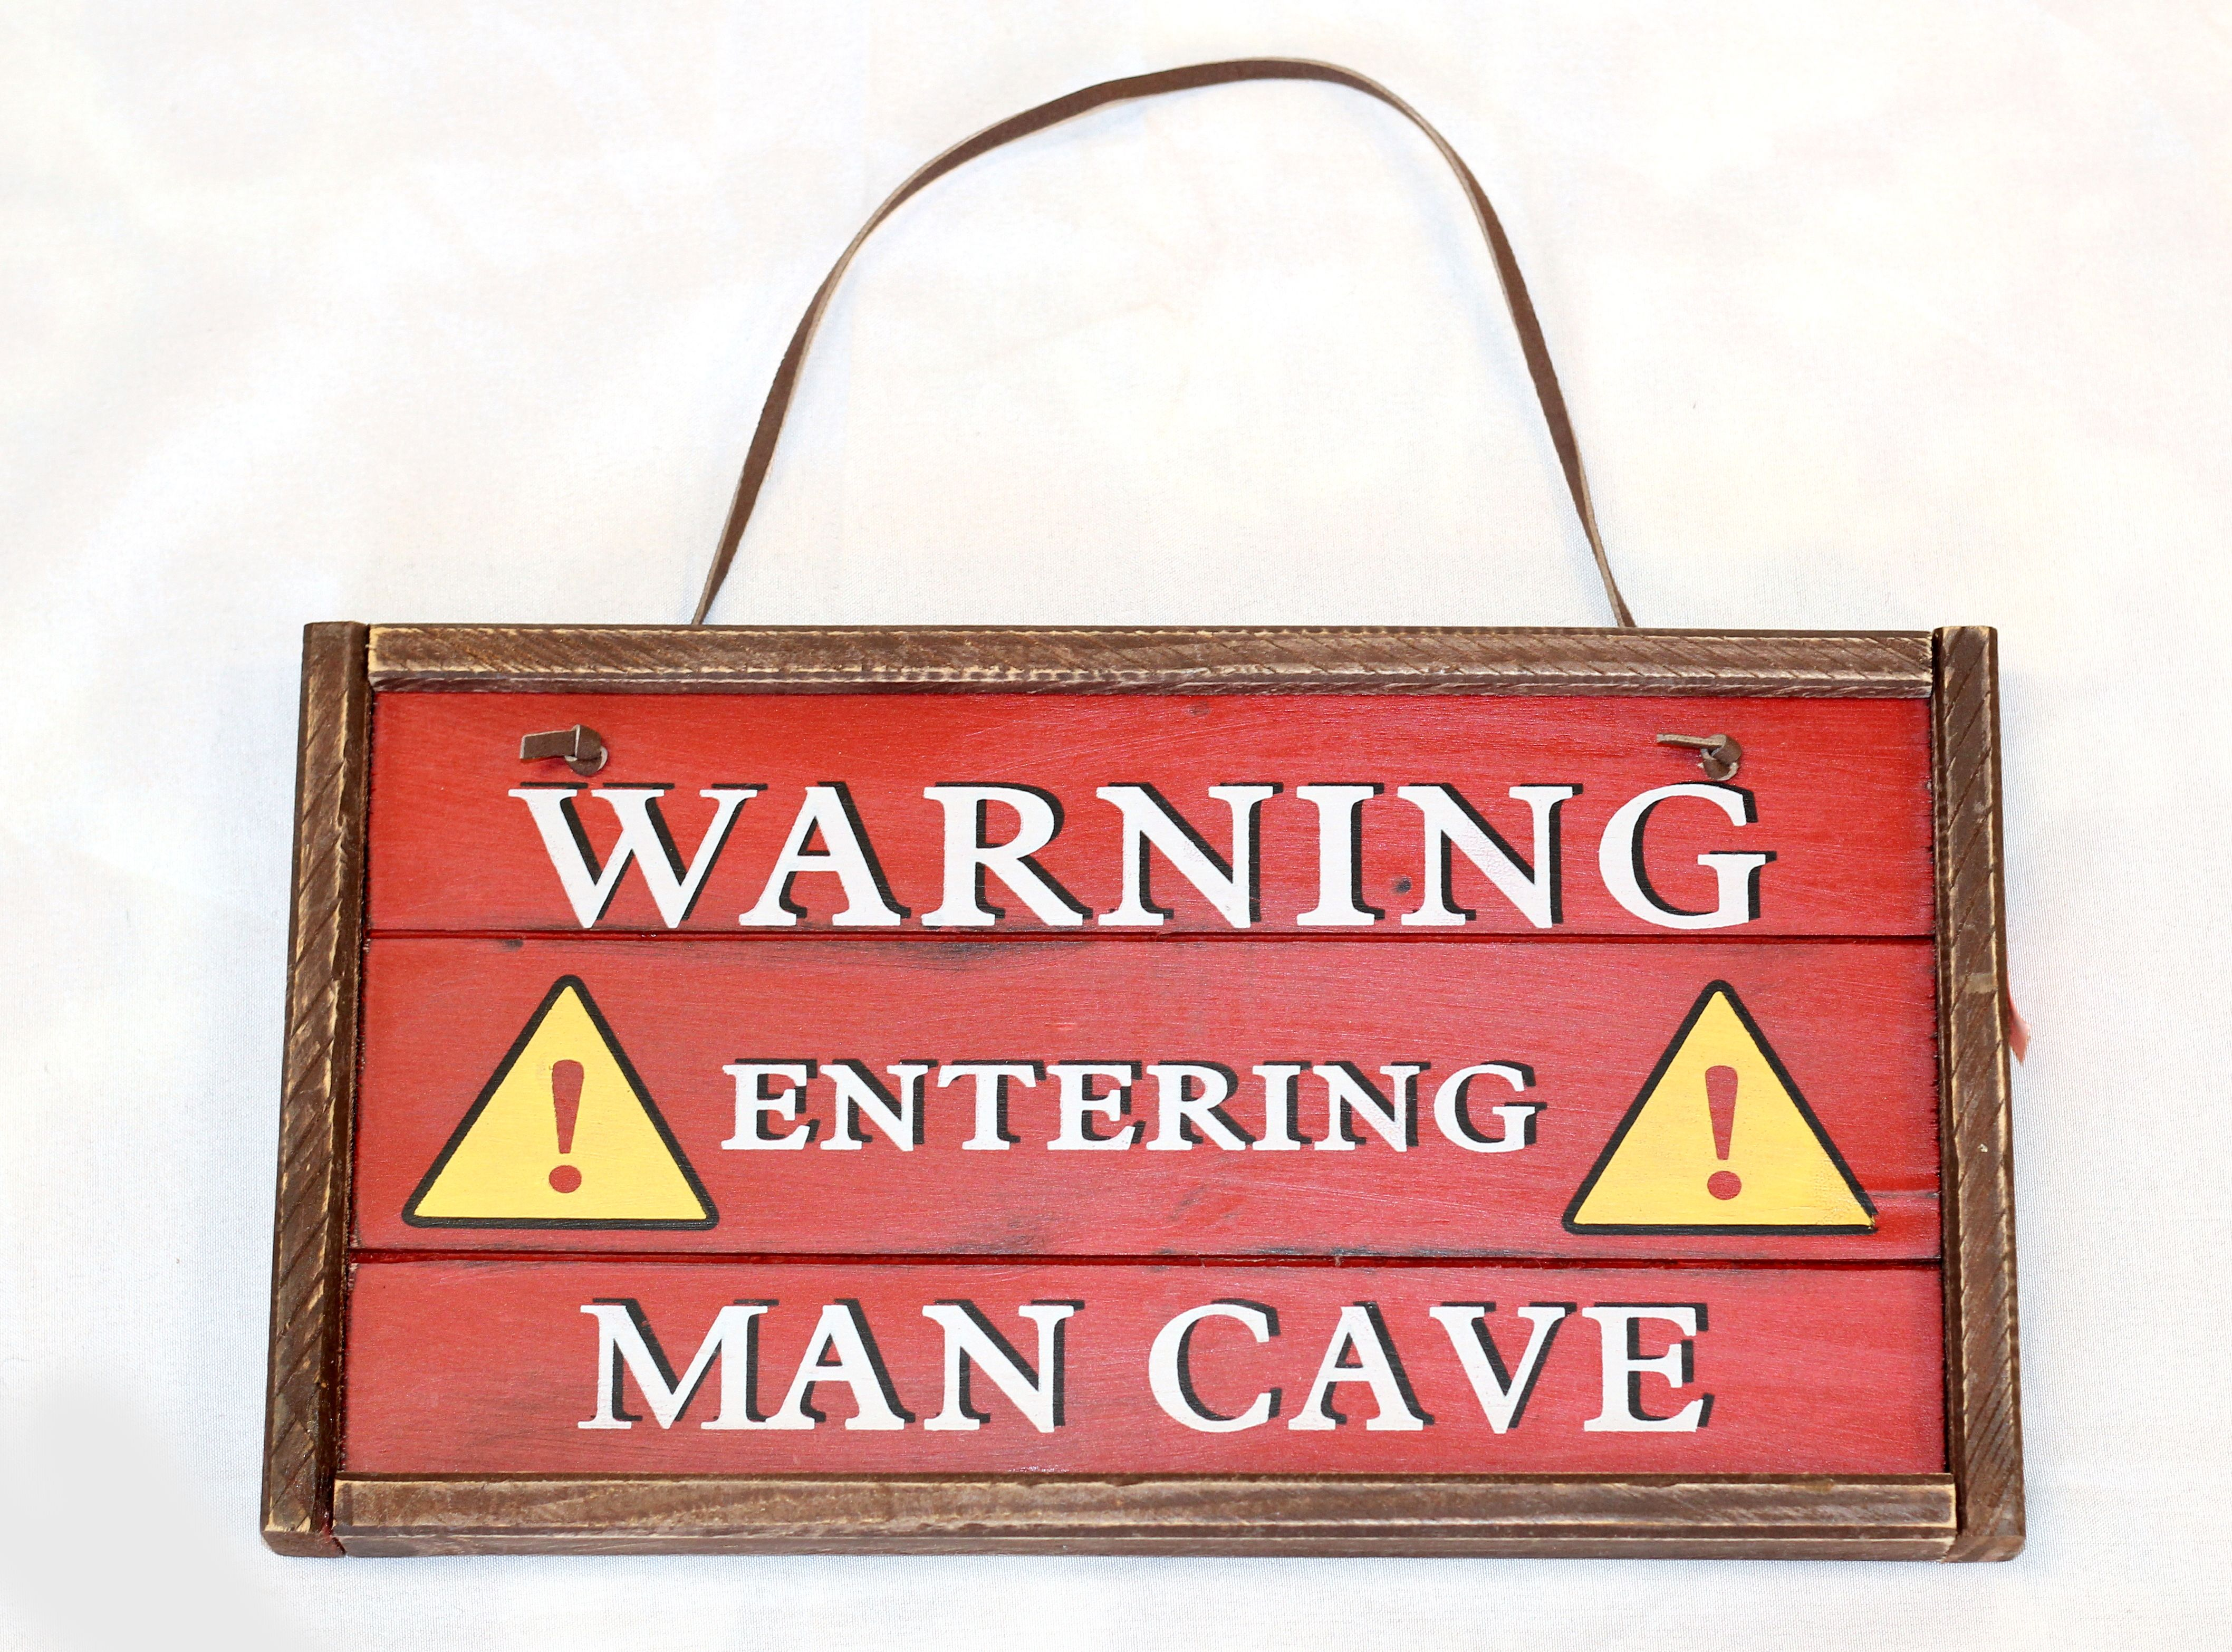 Warning! Man Cave!